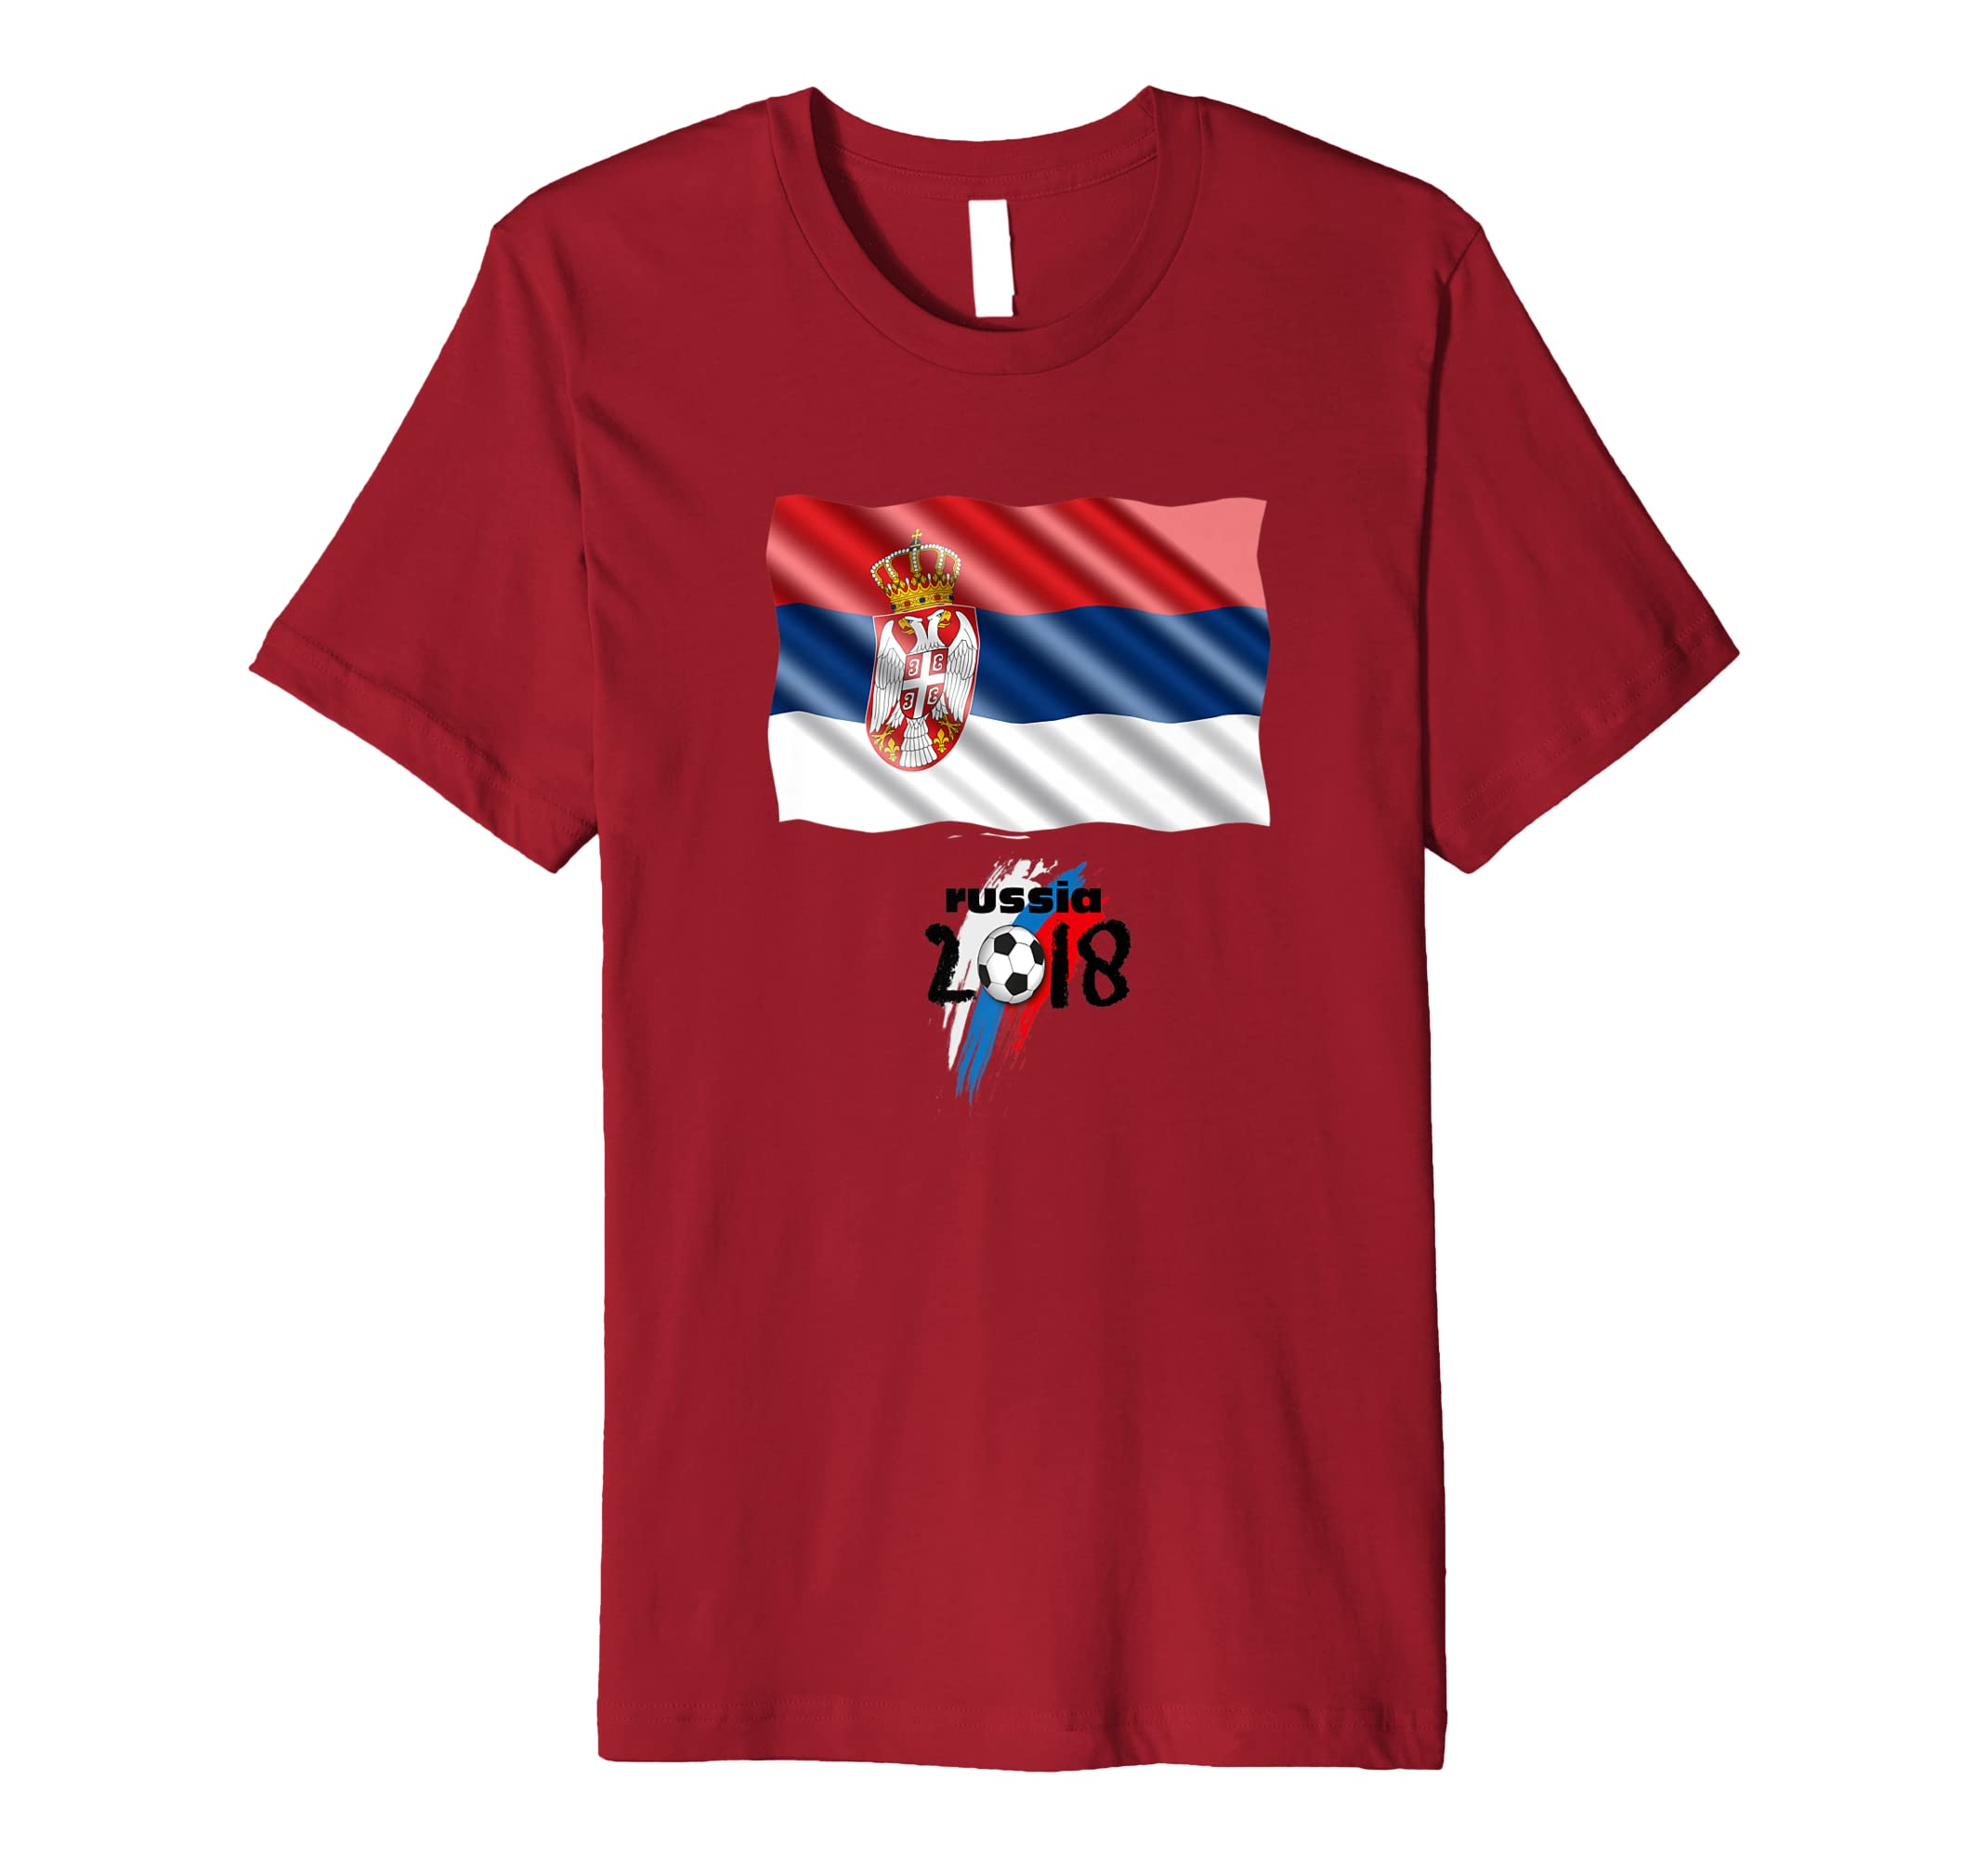 c05a24e913a Amazon.com: Unique World Football Tshirt- Serbia 2018 Cup Soccer Shirt:  Clothing